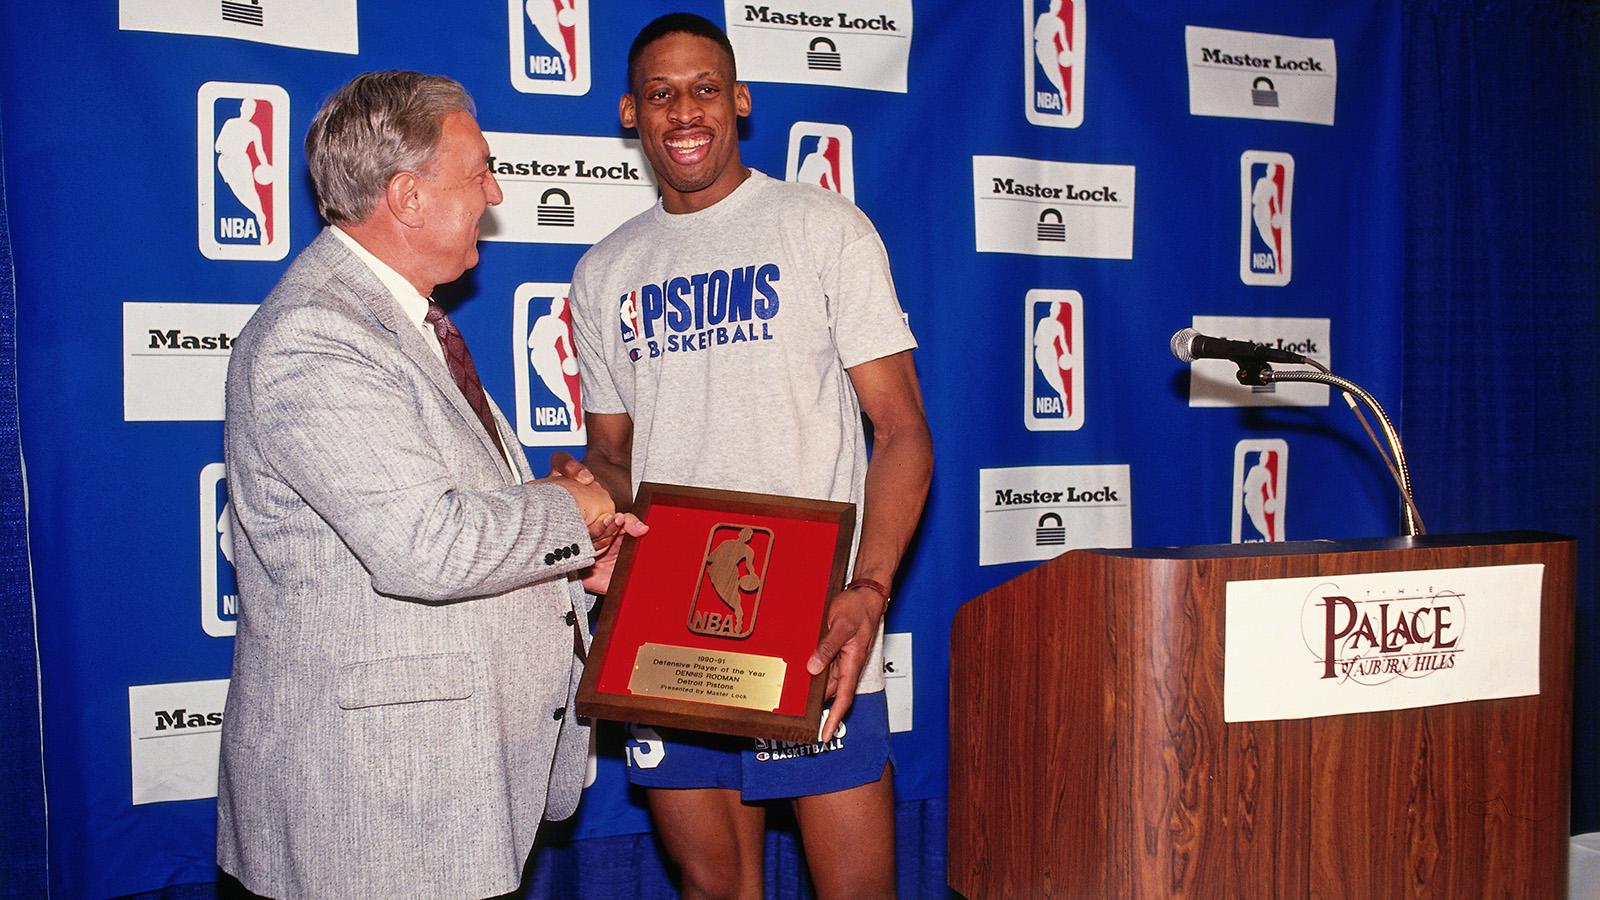 Dennis Rodman winning defensive player of the year